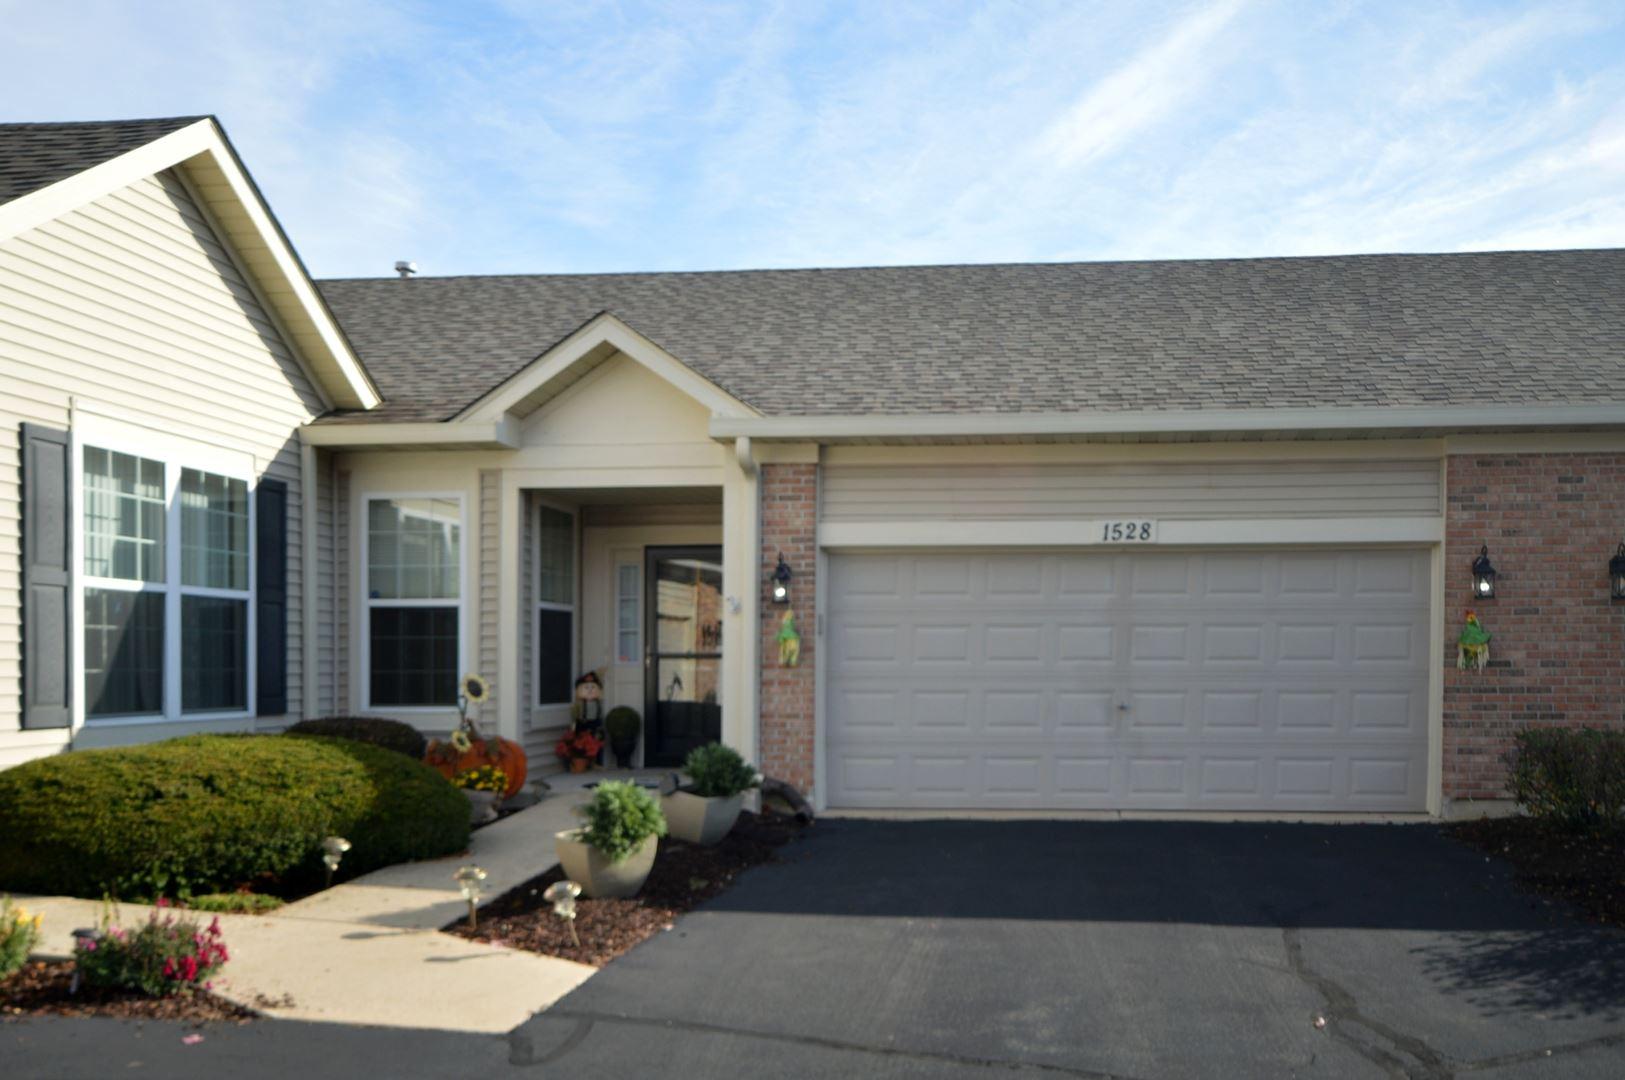 Photo of 1528 W Ludington Circle, Romeoville, IL 60446 (MLS # 10912339)